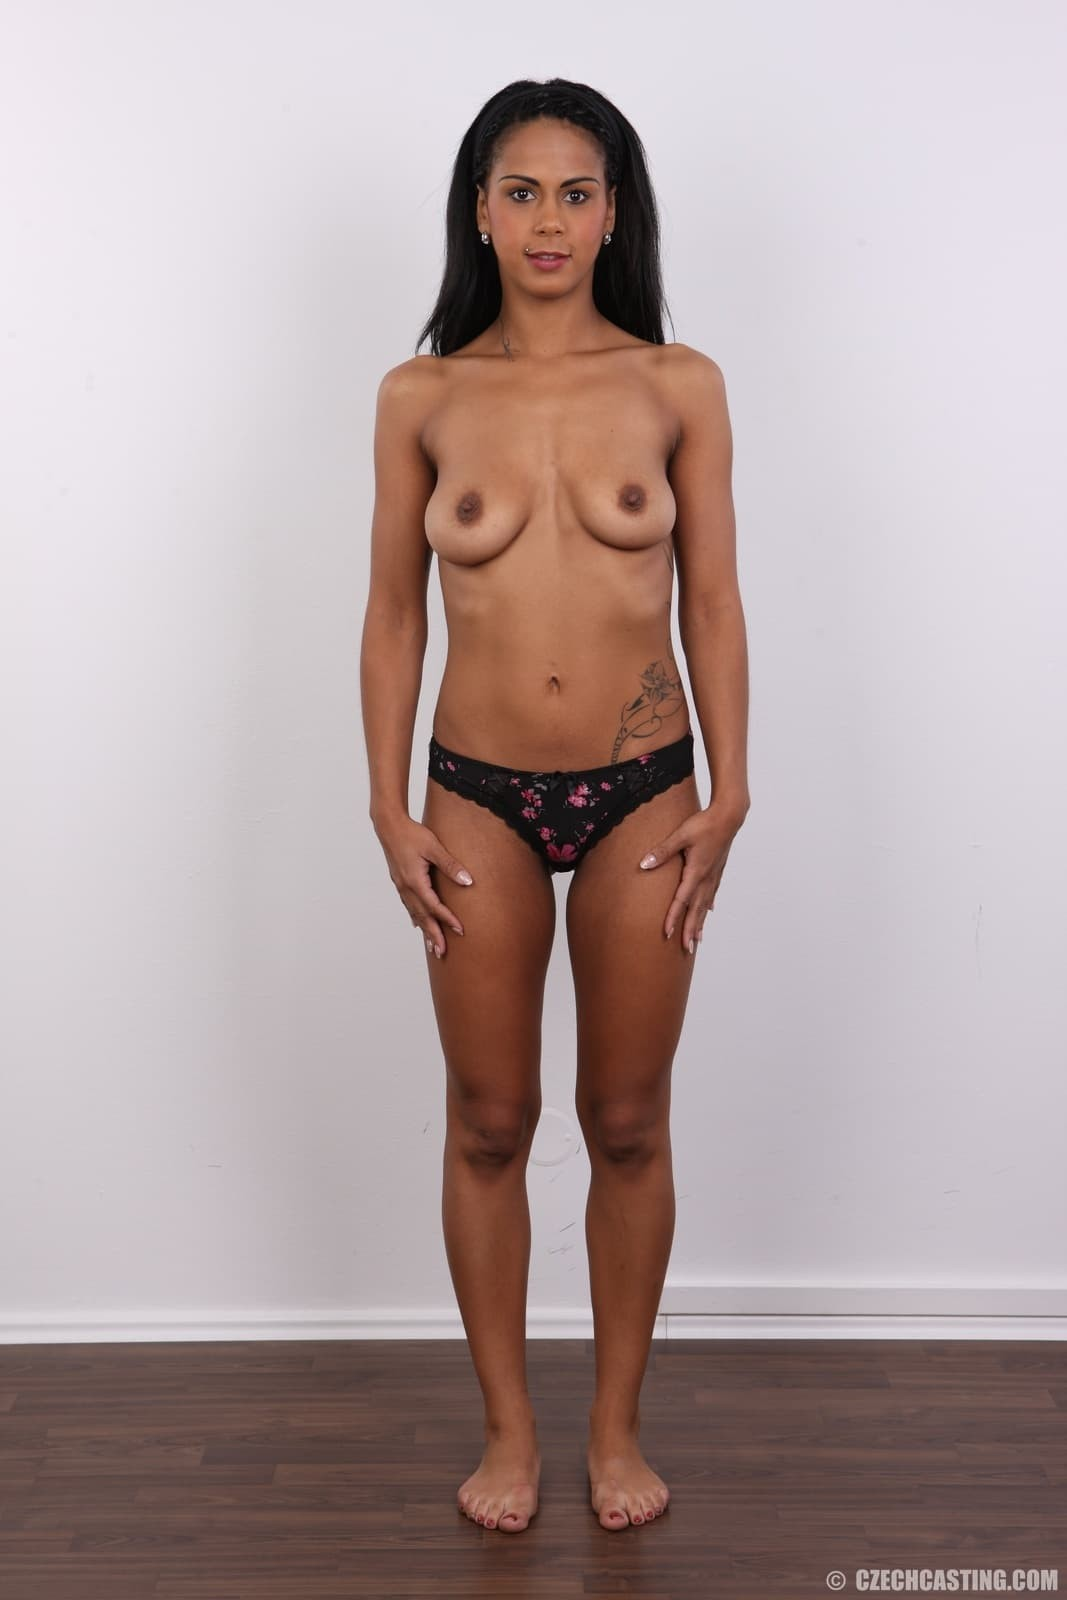 Девушка разделась до гола на кастинге - фото